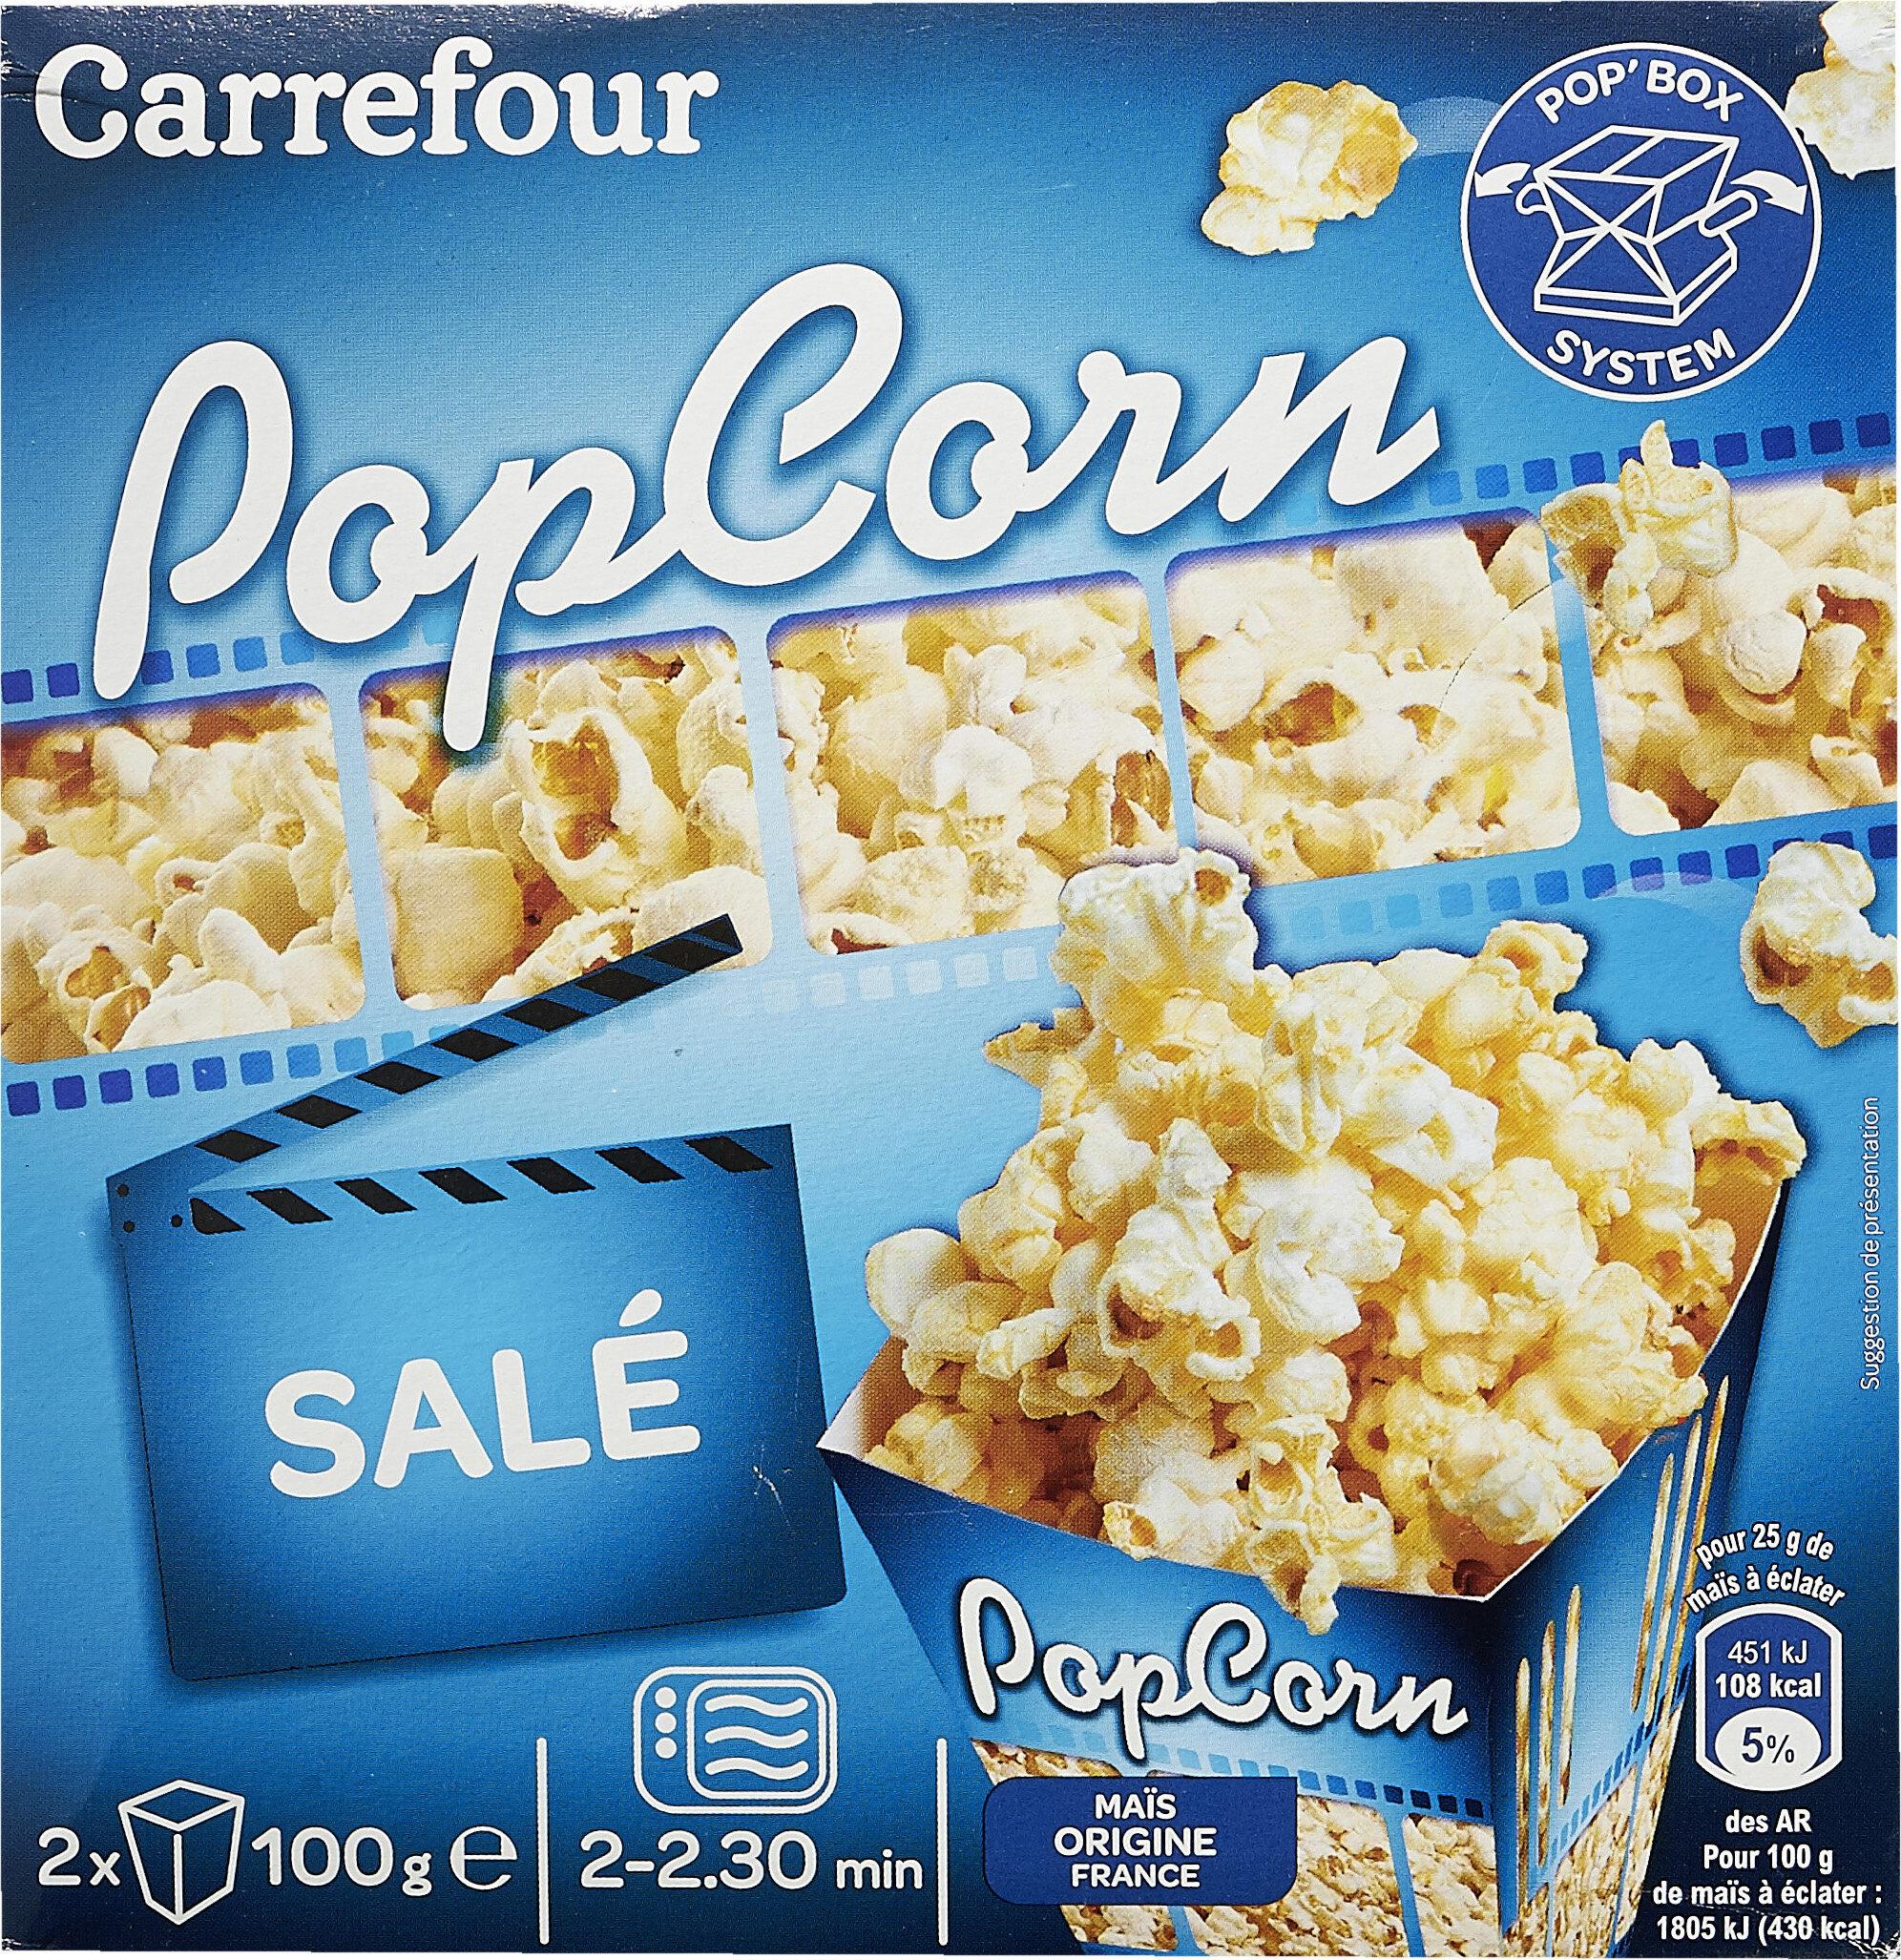 Popcorn salé - Prodotto - fr